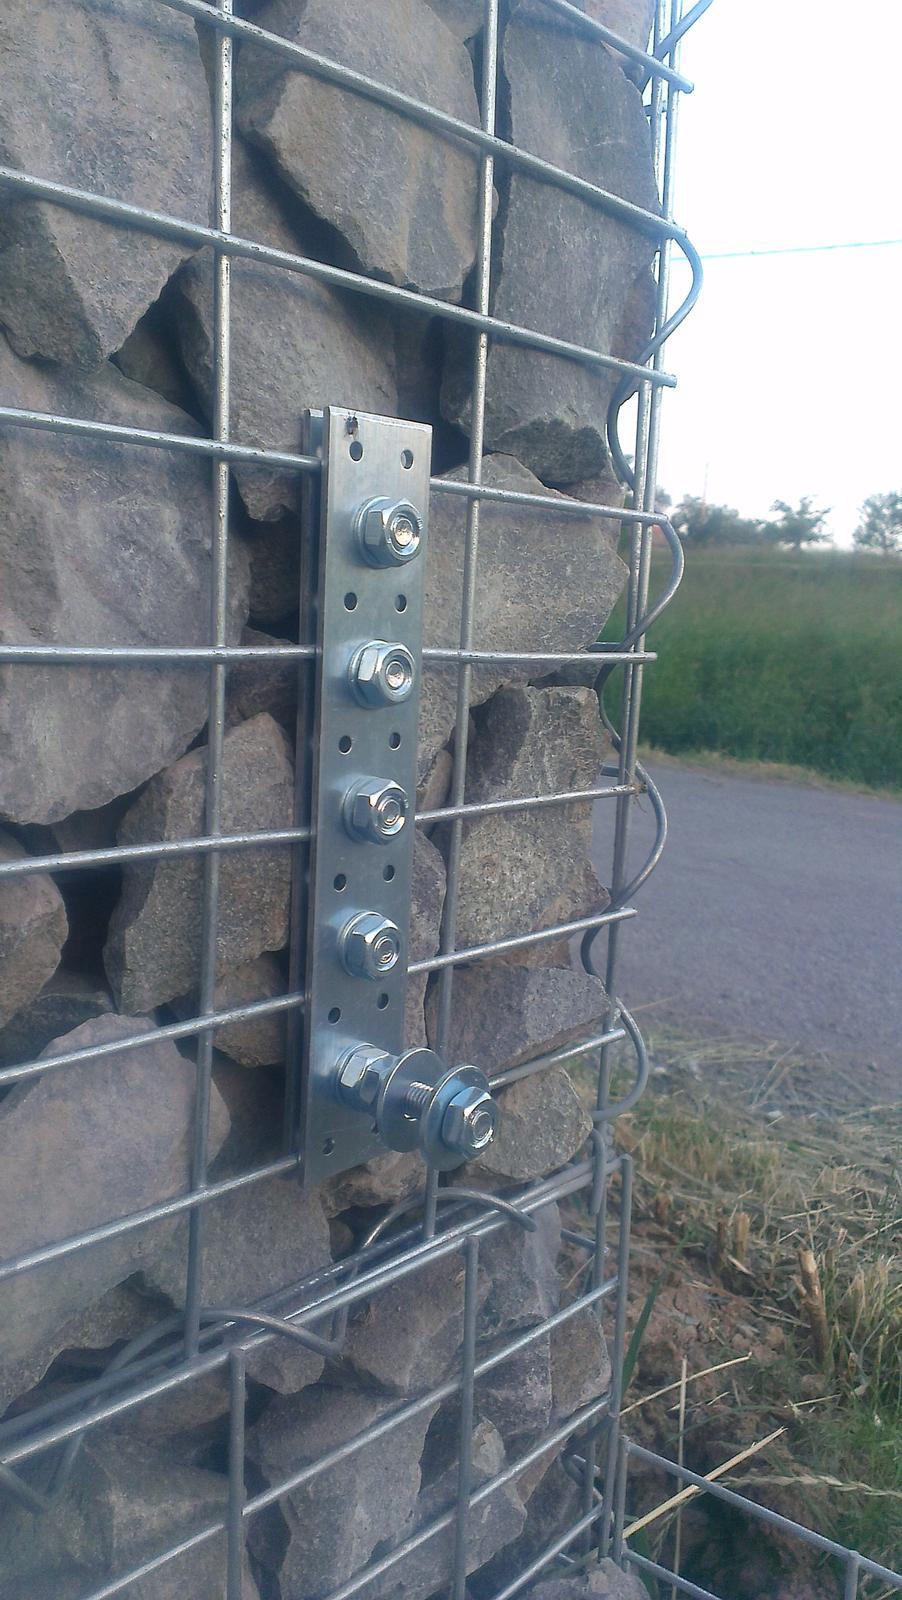 Plot - Pokus o riesenie ako namontovat vyplnu plota na gabion